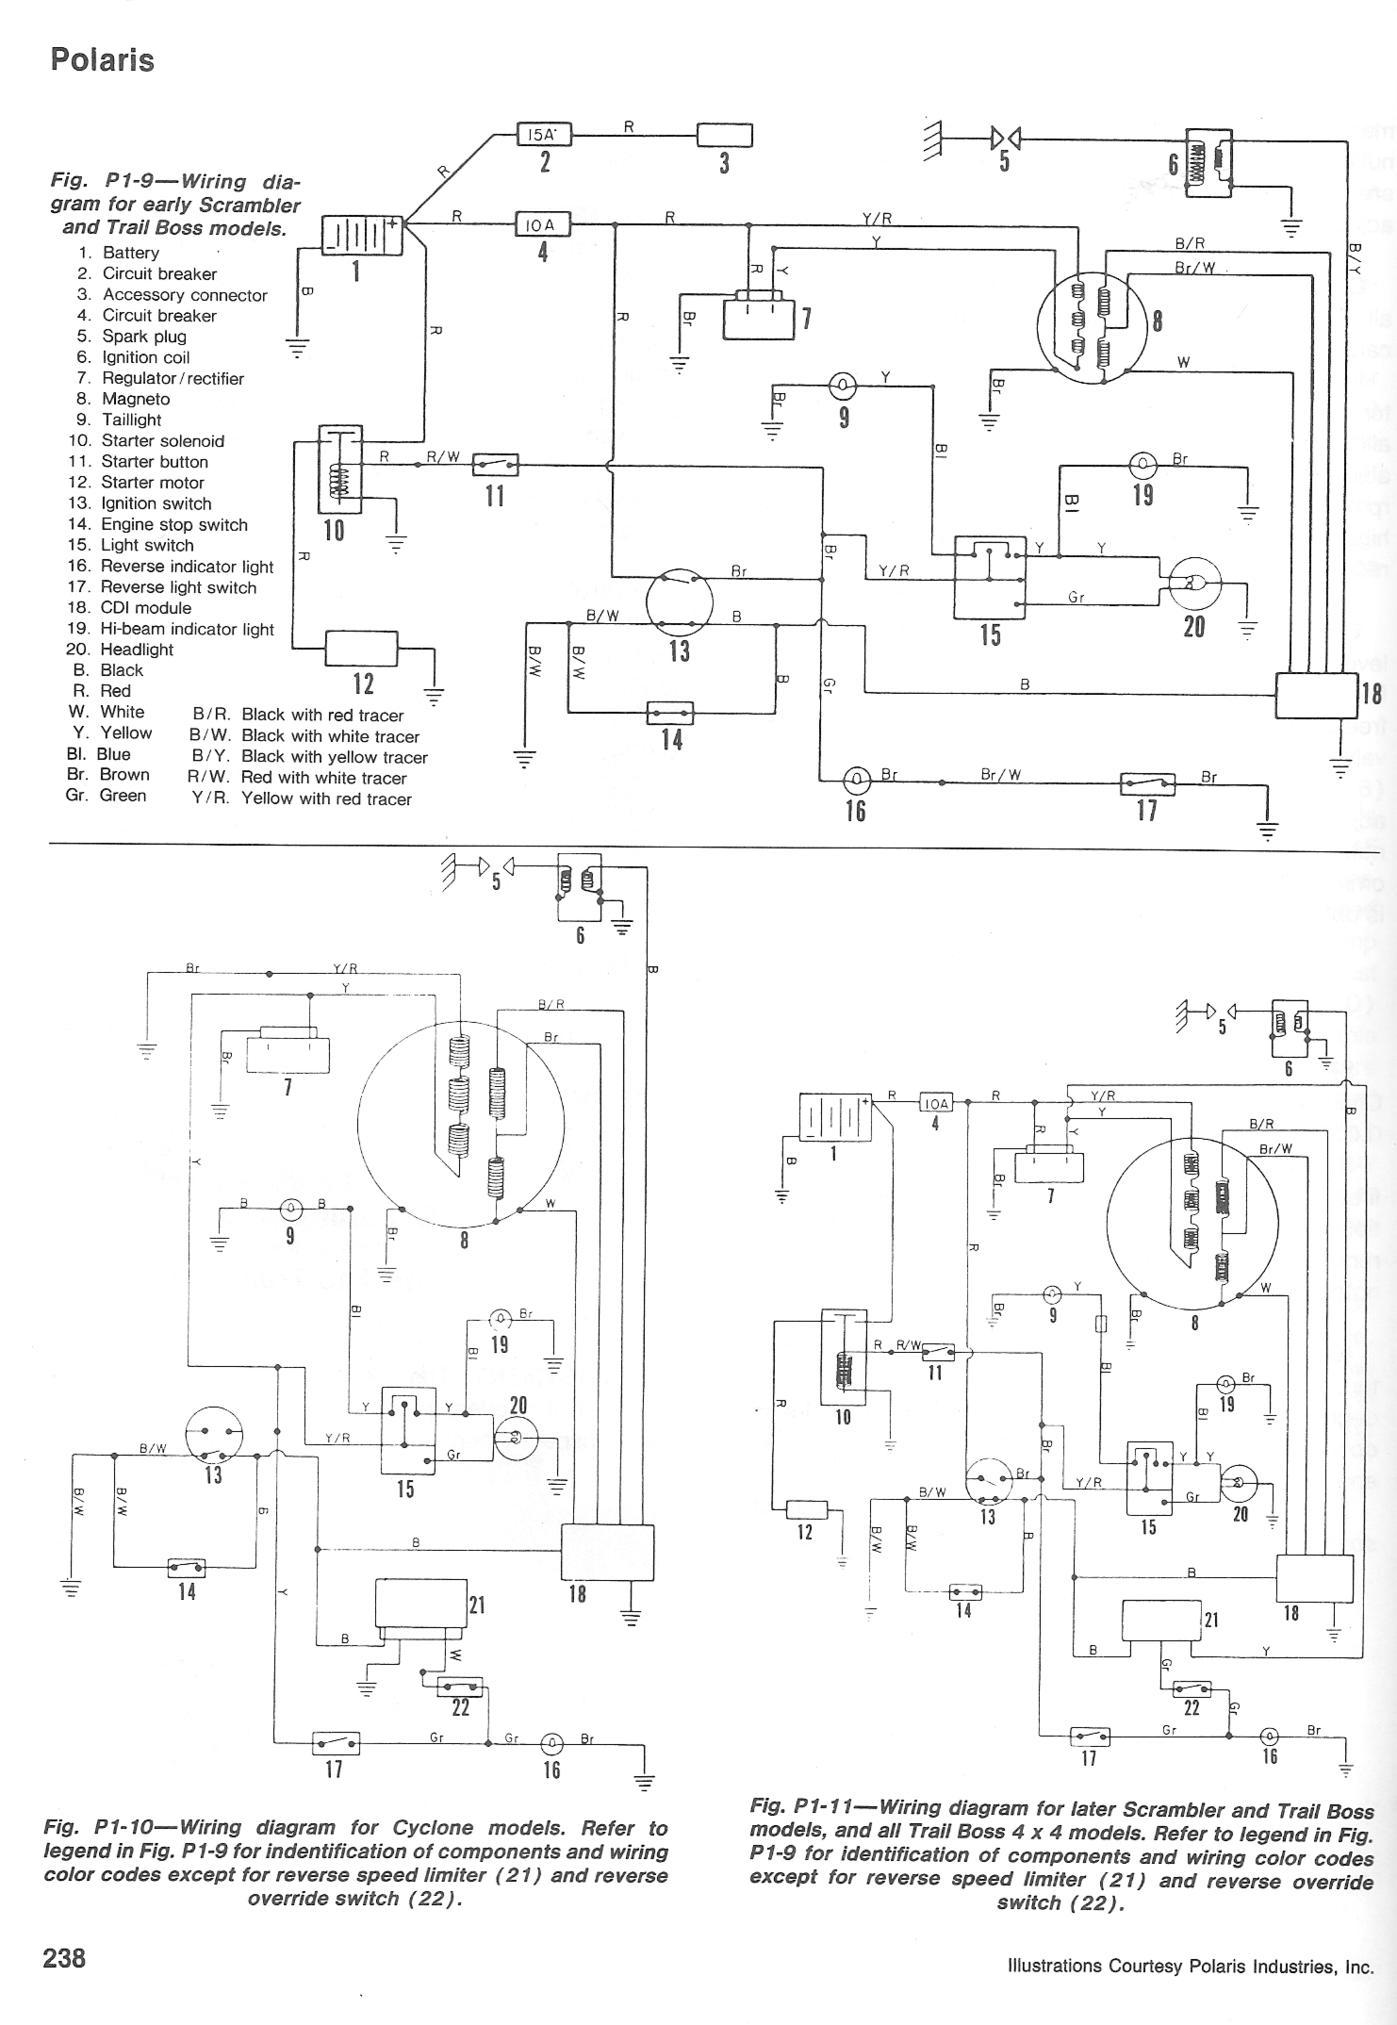 polaris ace wiring diagram skyteam ace wiring diagram